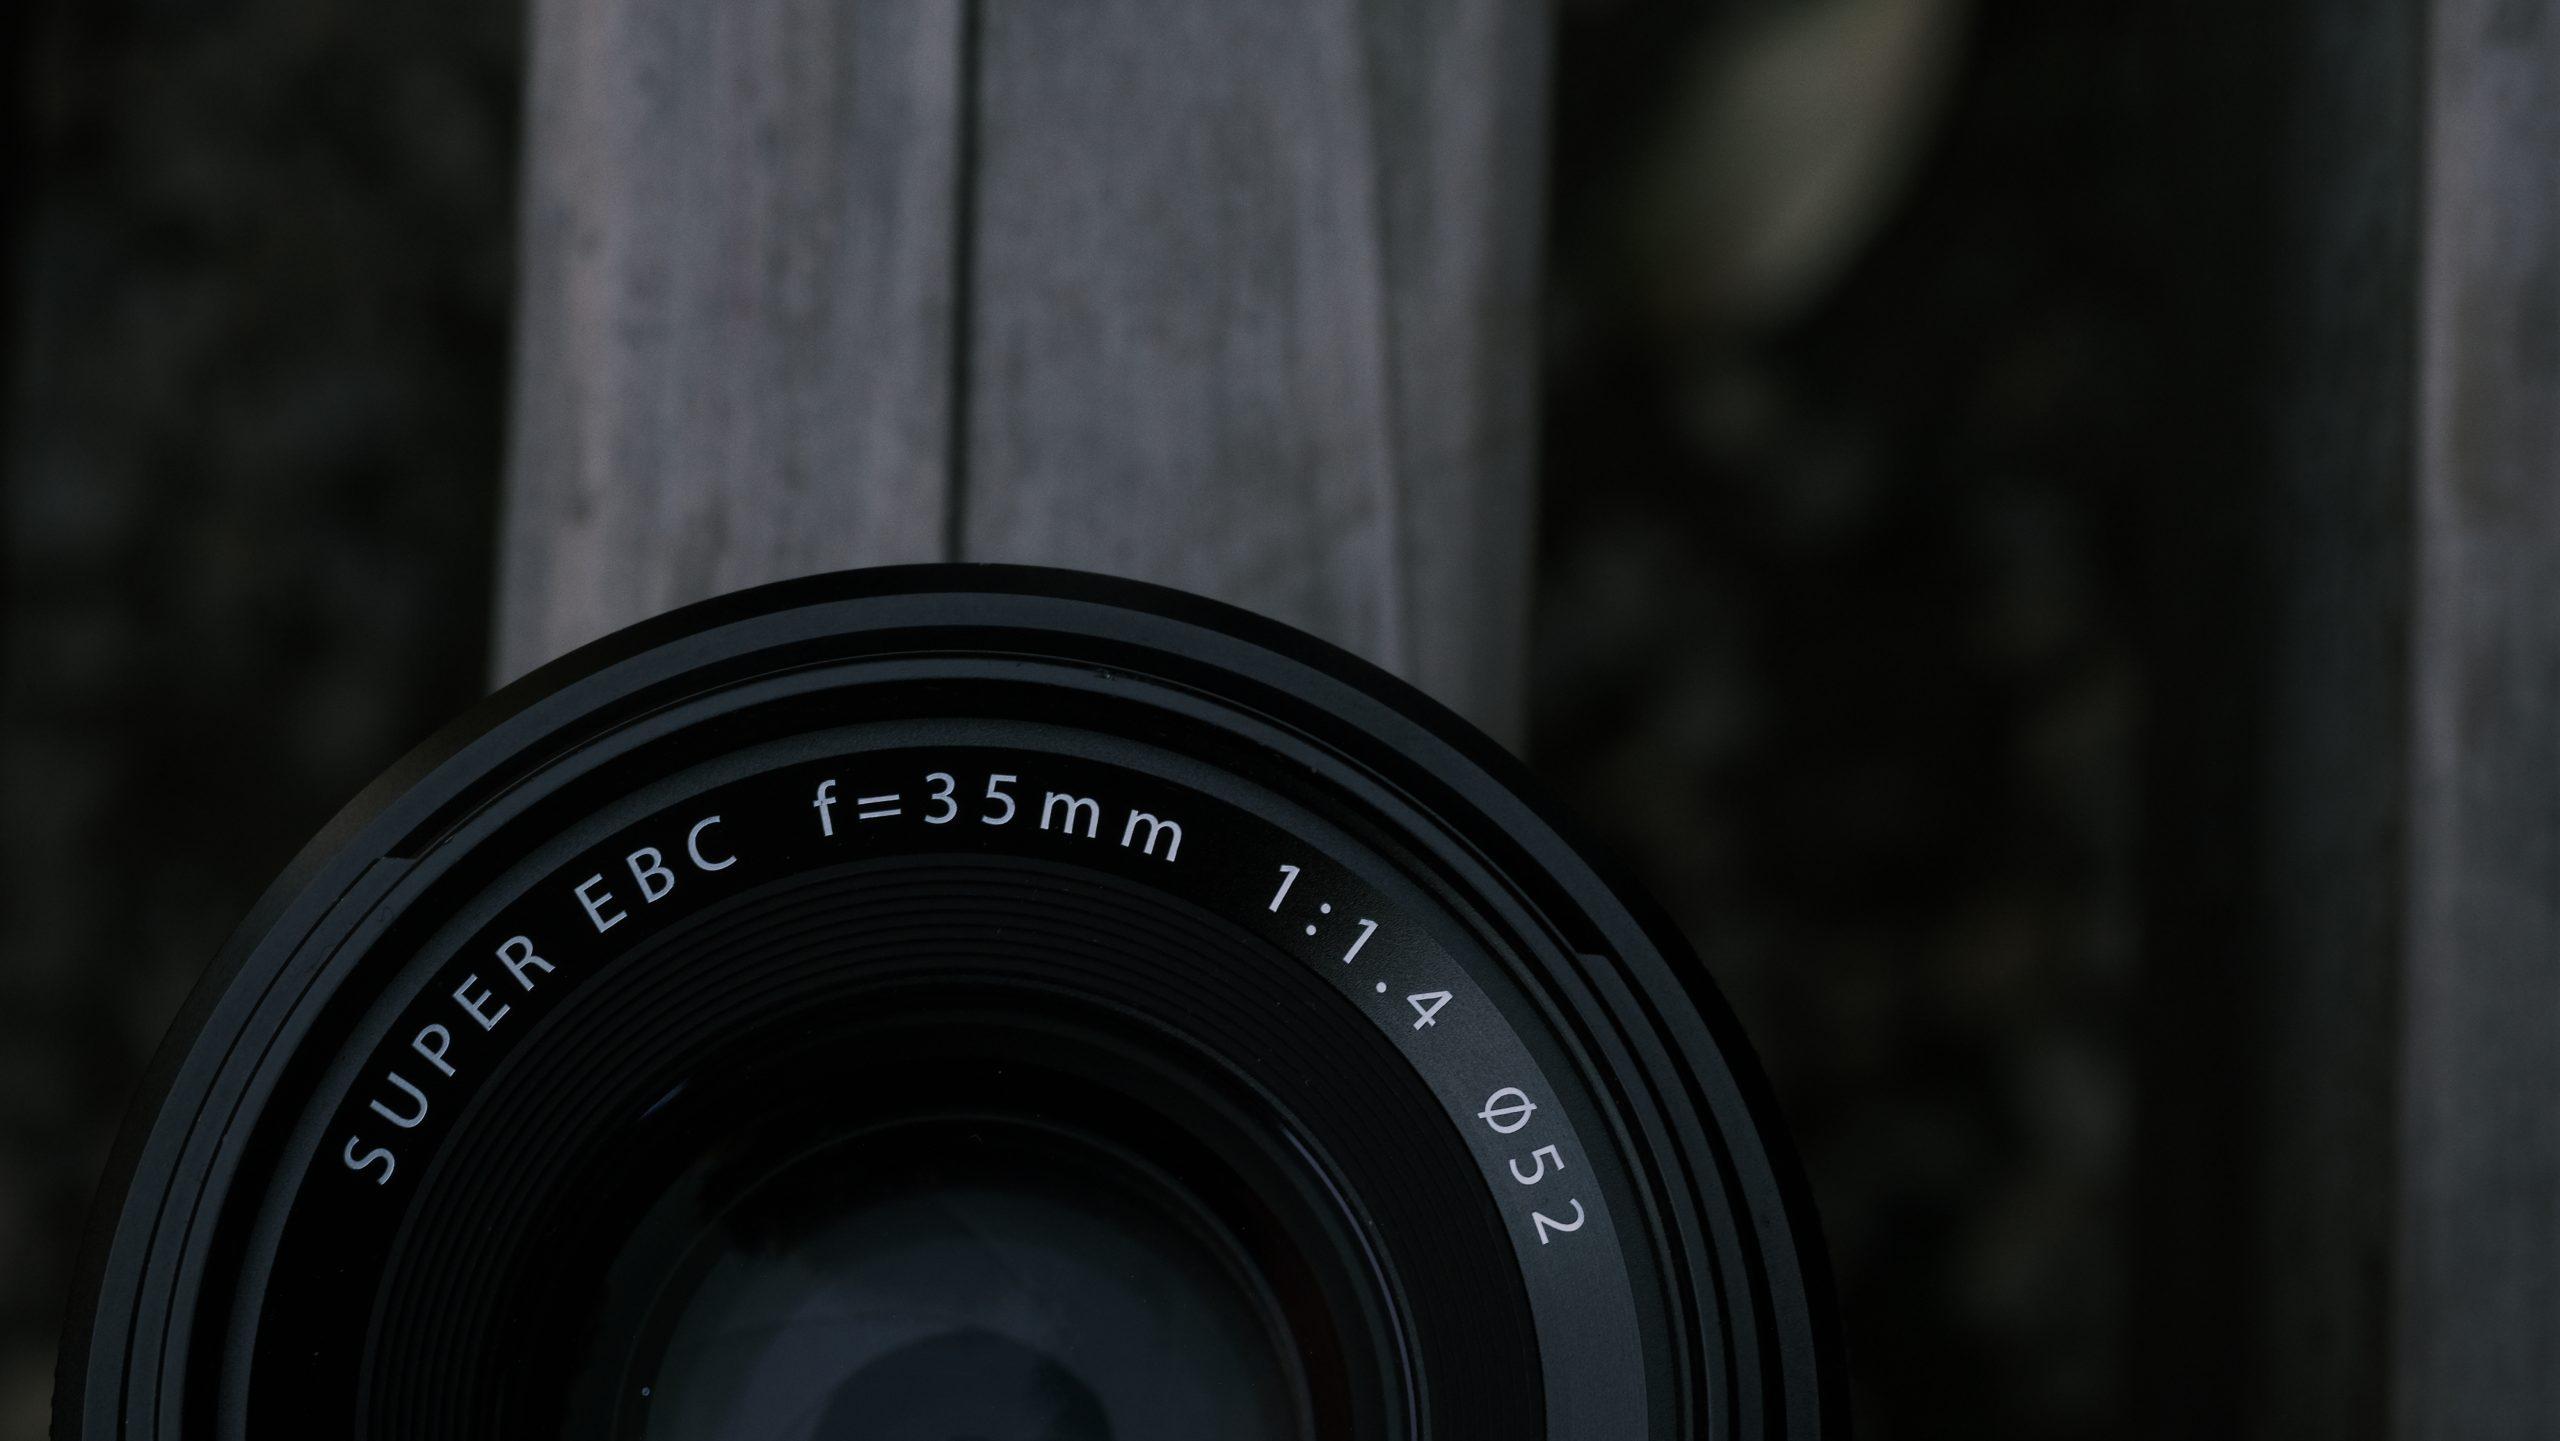 【FUJIFILM】クラシックネガで庭園を撮る 〜XF35mmF1.4R〜